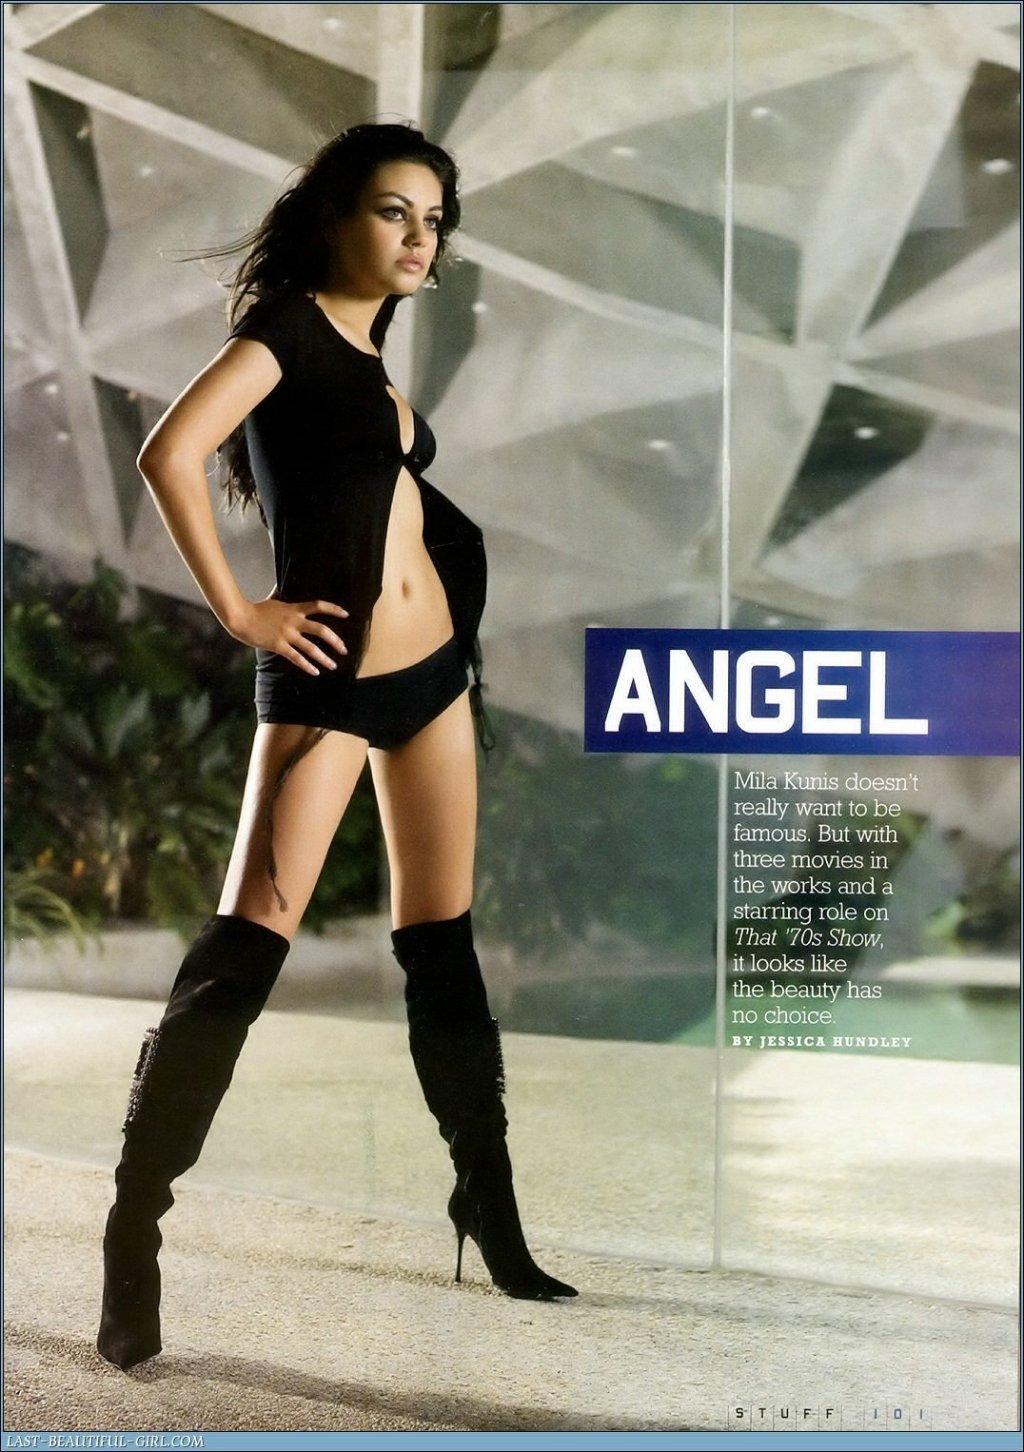 http://4.bp.blogspot.com/_iqp2h_ZOCac/TFxUAif3m9I/AAAAAAAAOFU/OmCwlkPZrT4/s1600/_Sexy_Mila_Kunis_Pictures_6.jpg